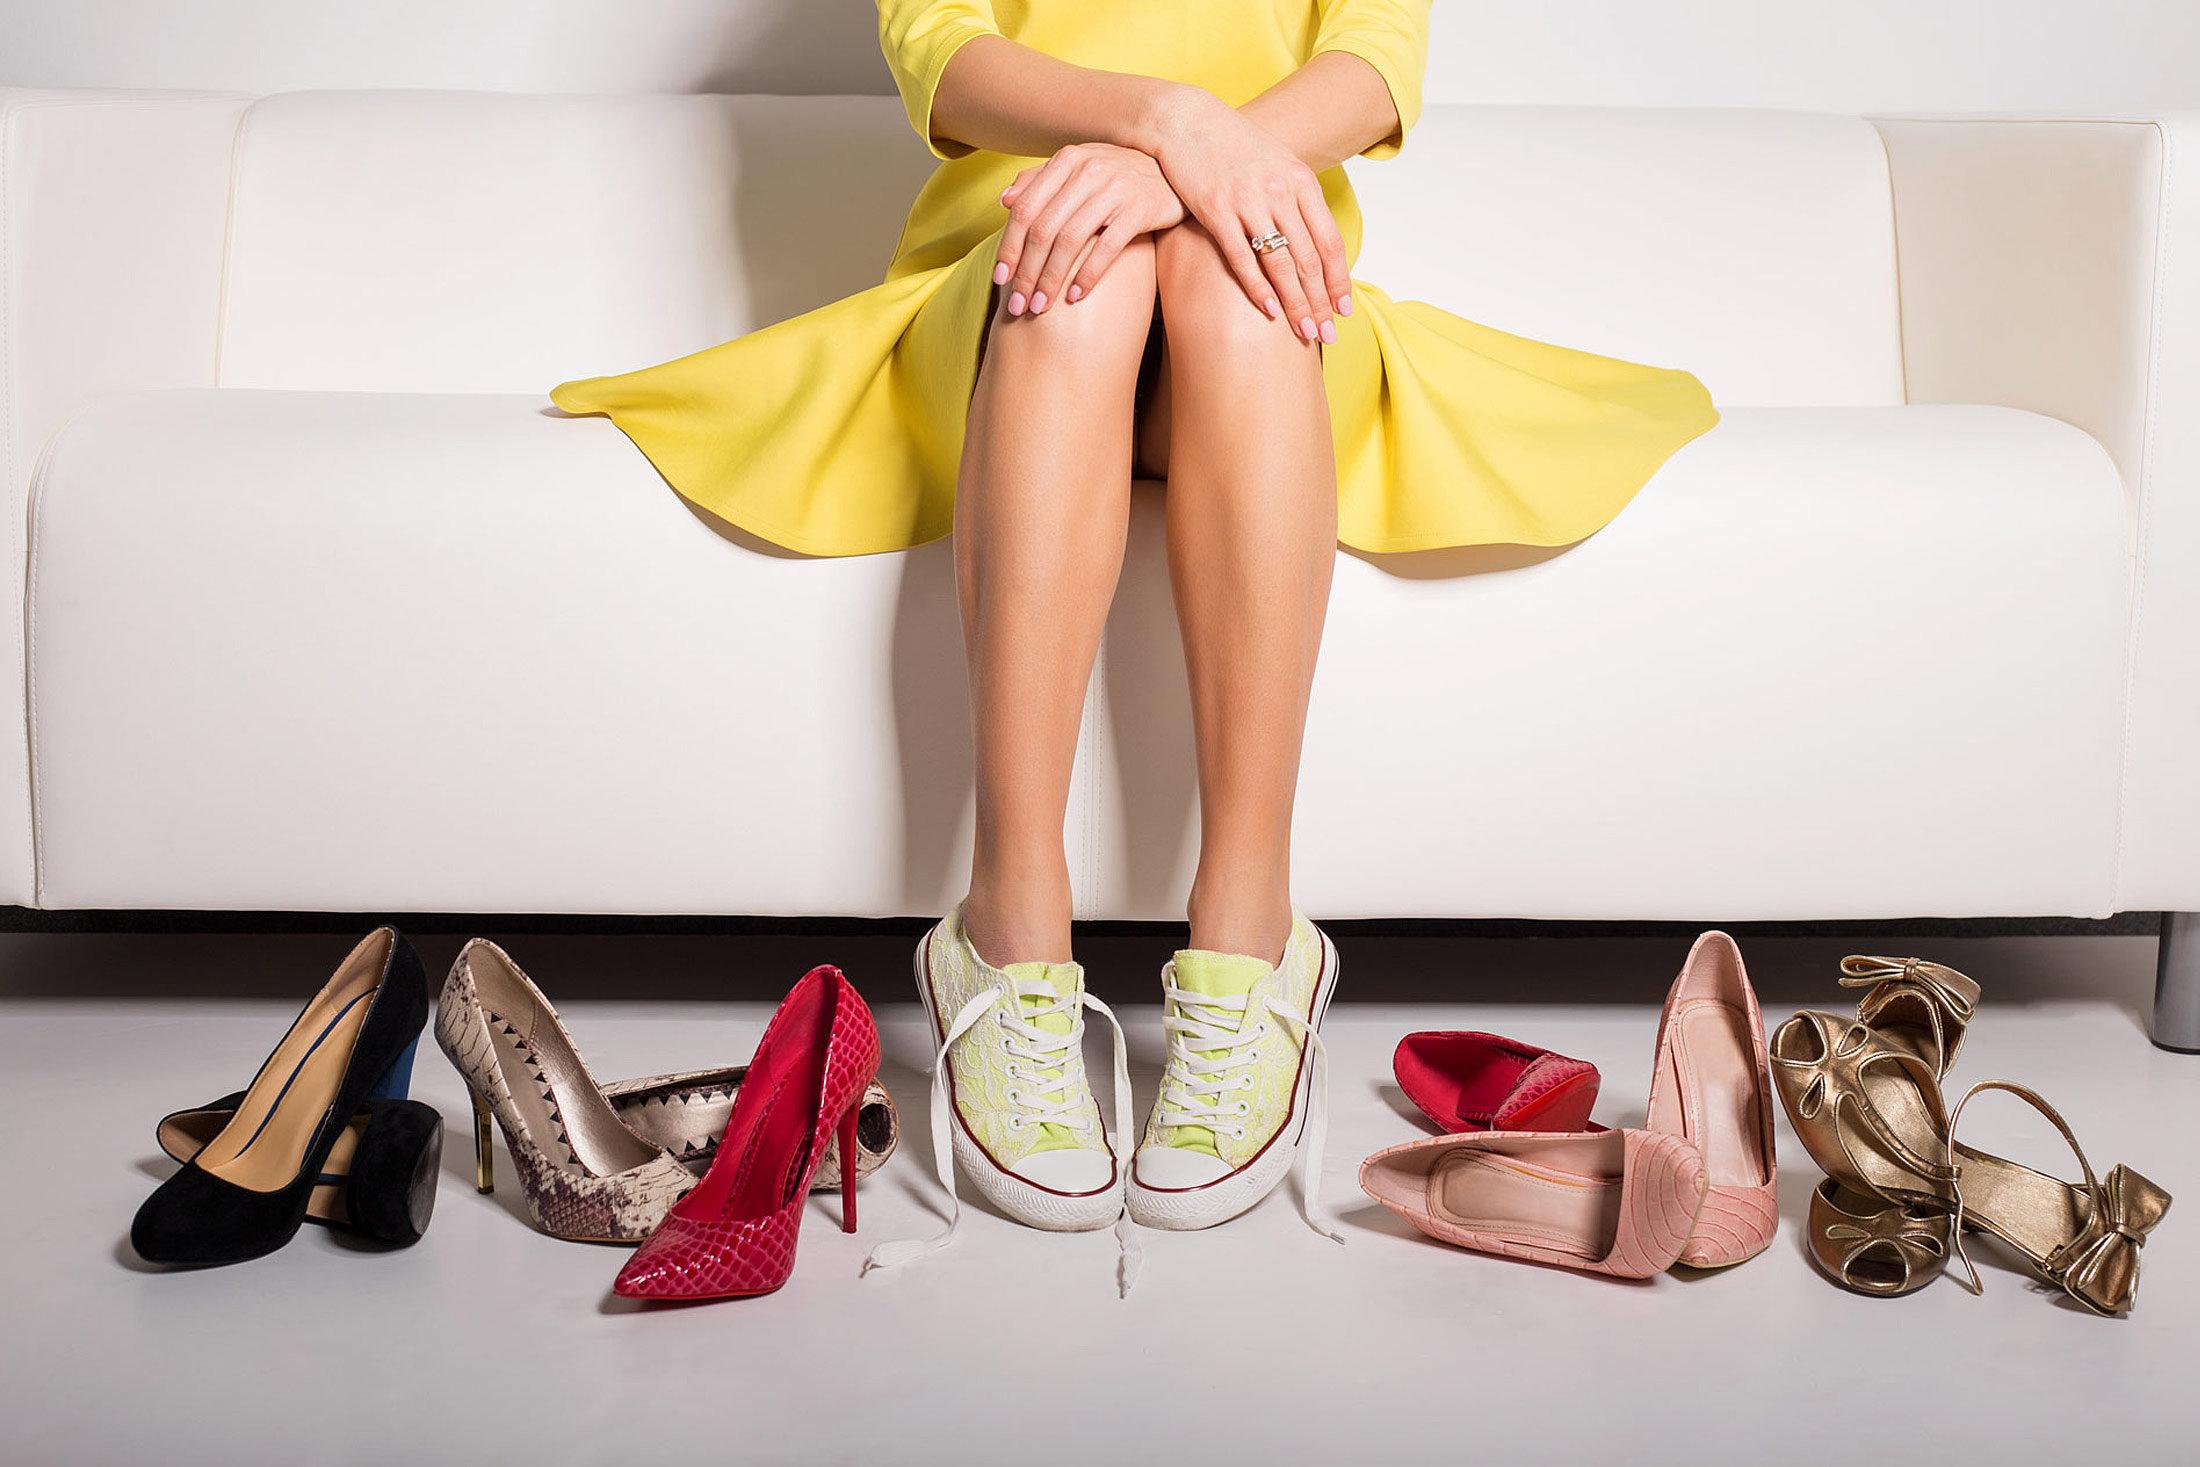 KERN Schuhe | Mode | Lifestyle Schrobenhausen